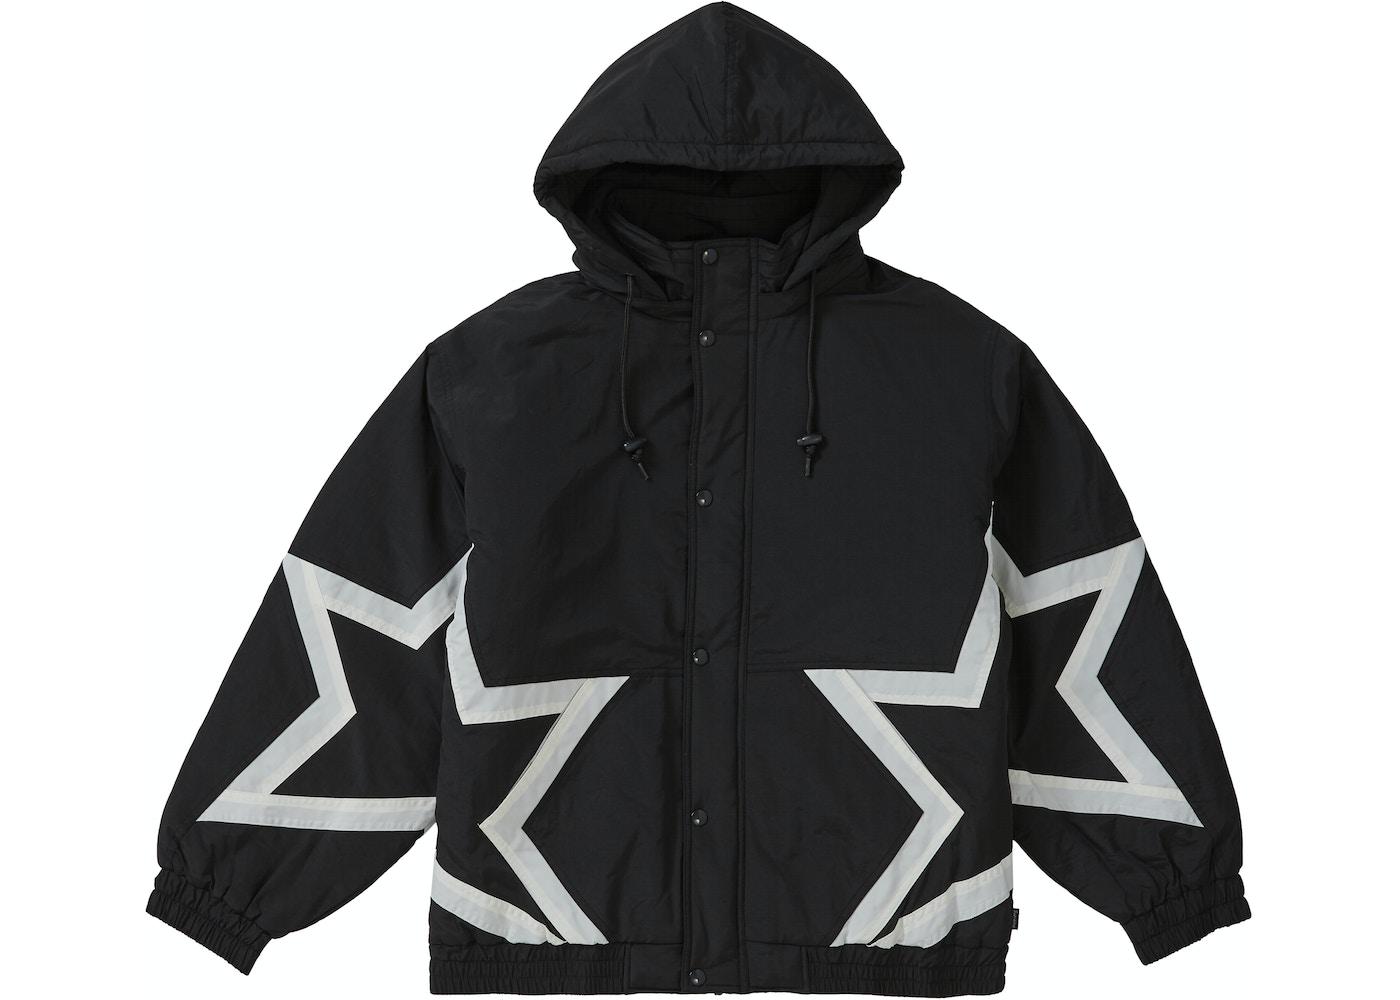 0d06a1f5 Supreme Stars Puffy Jacket Black - SS19